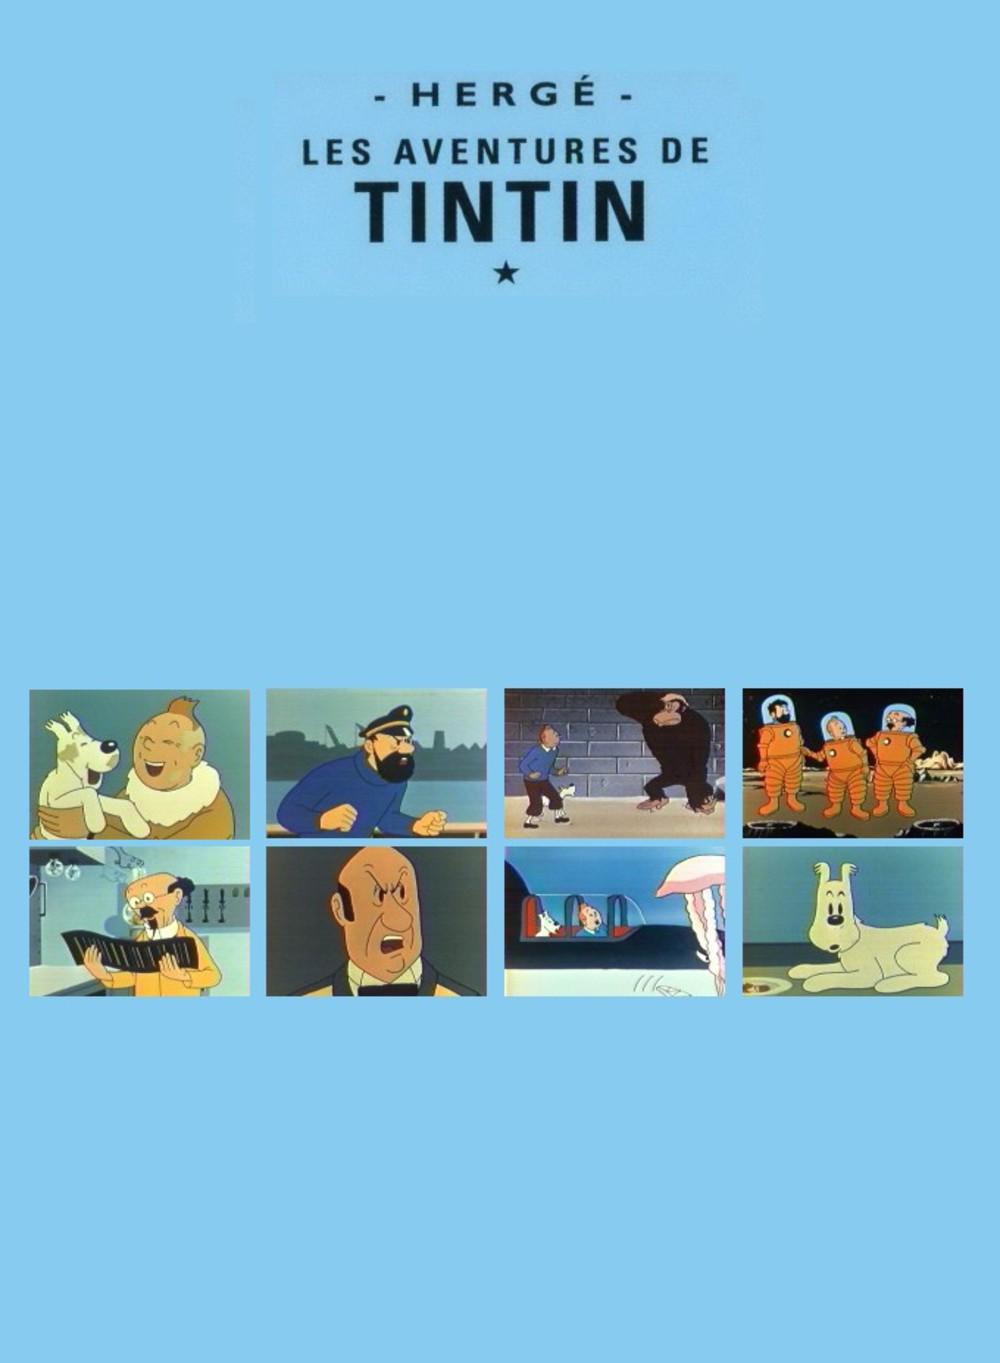 tintin movie torrent